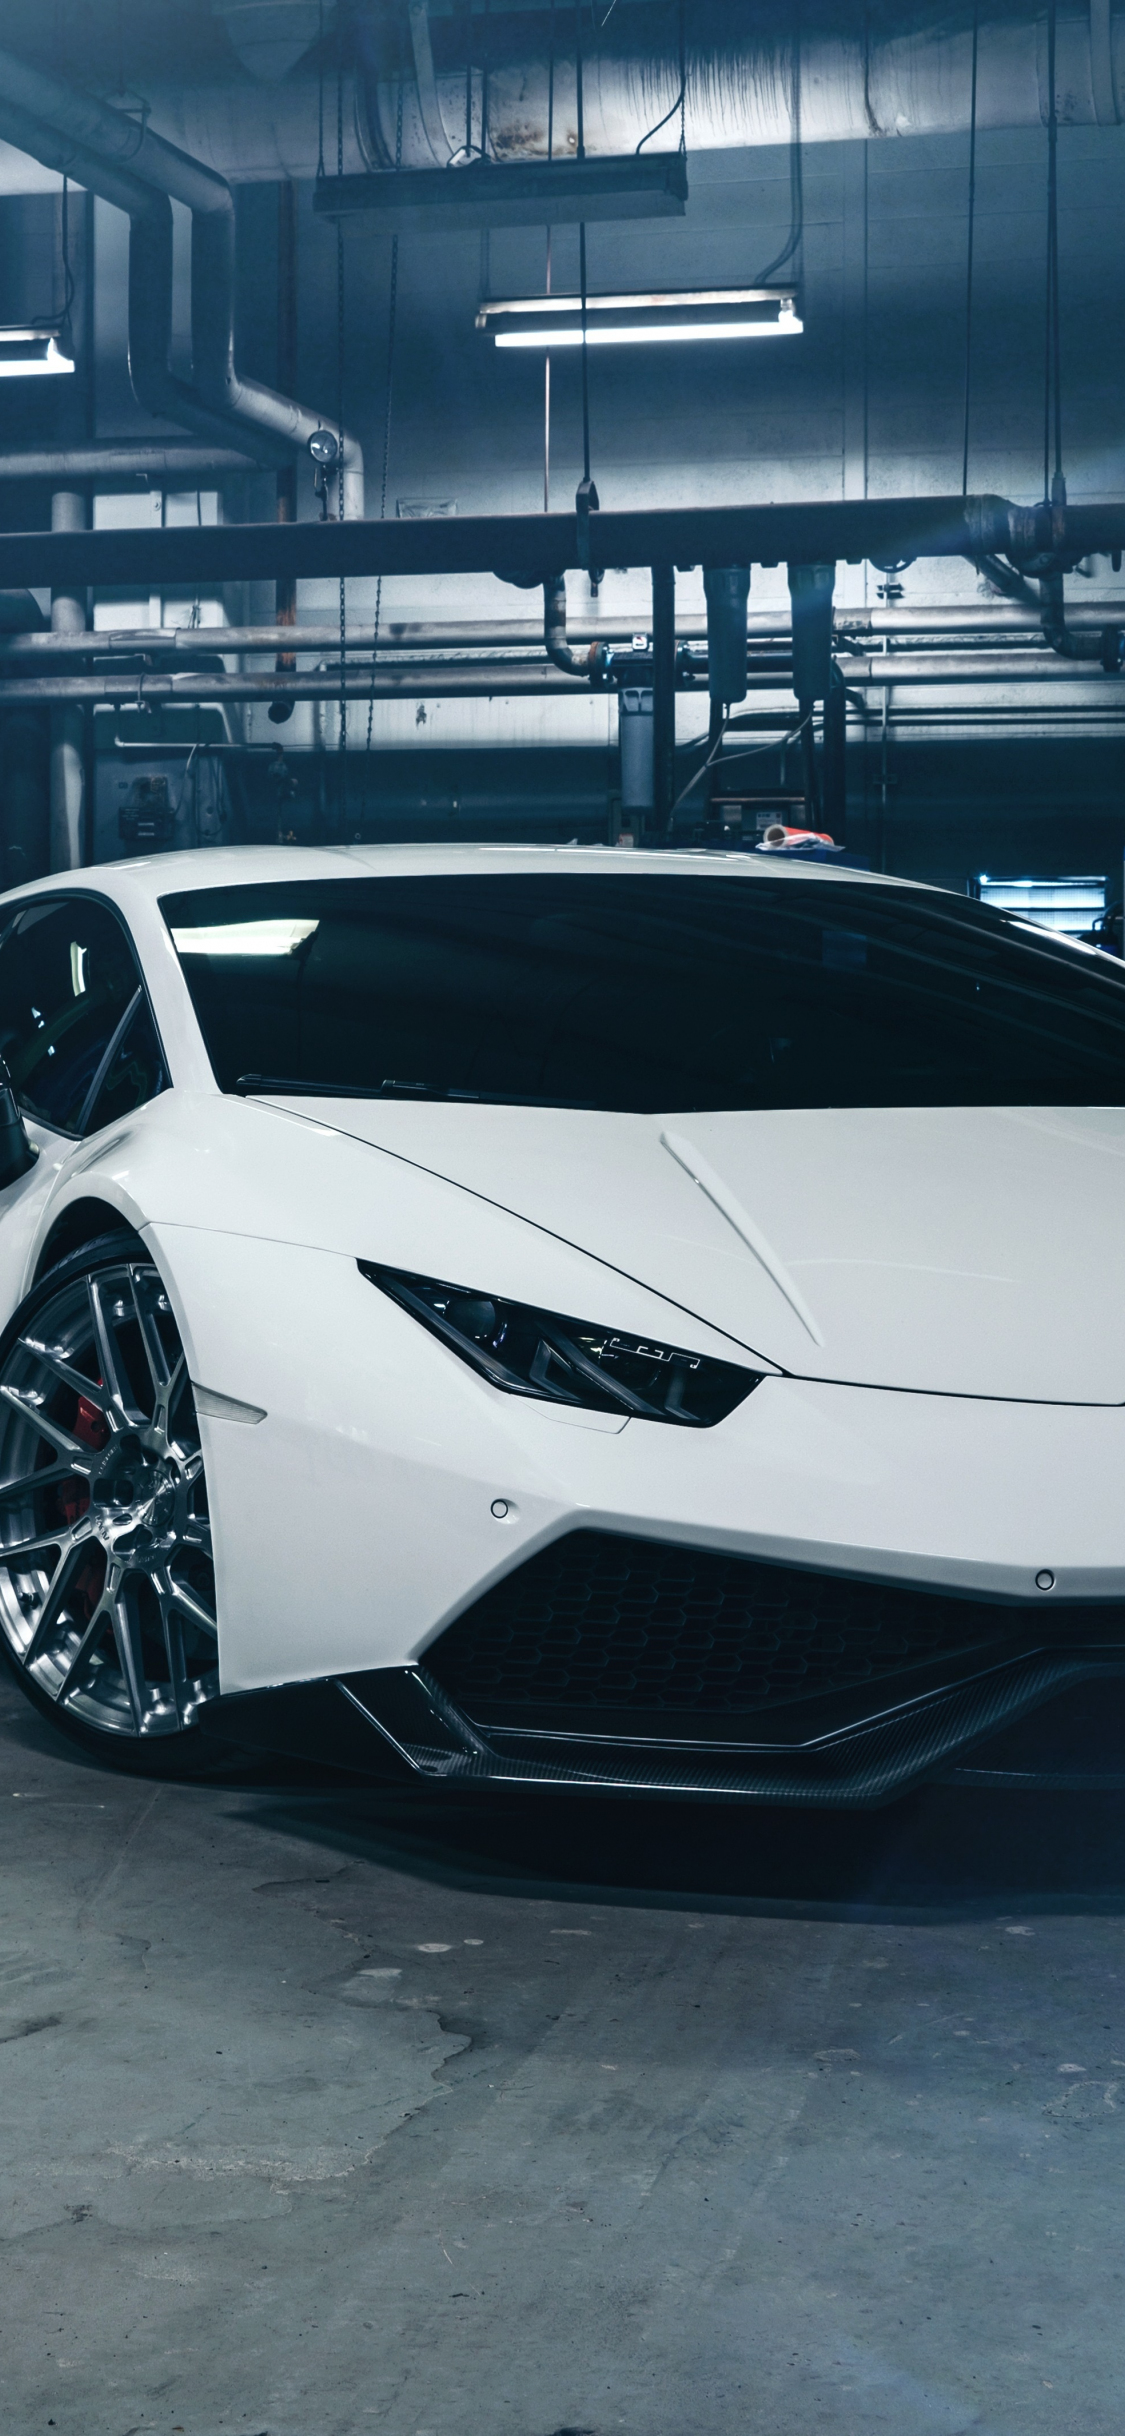 Download 1125x2436 Wallpaper White Sport Lamborghini